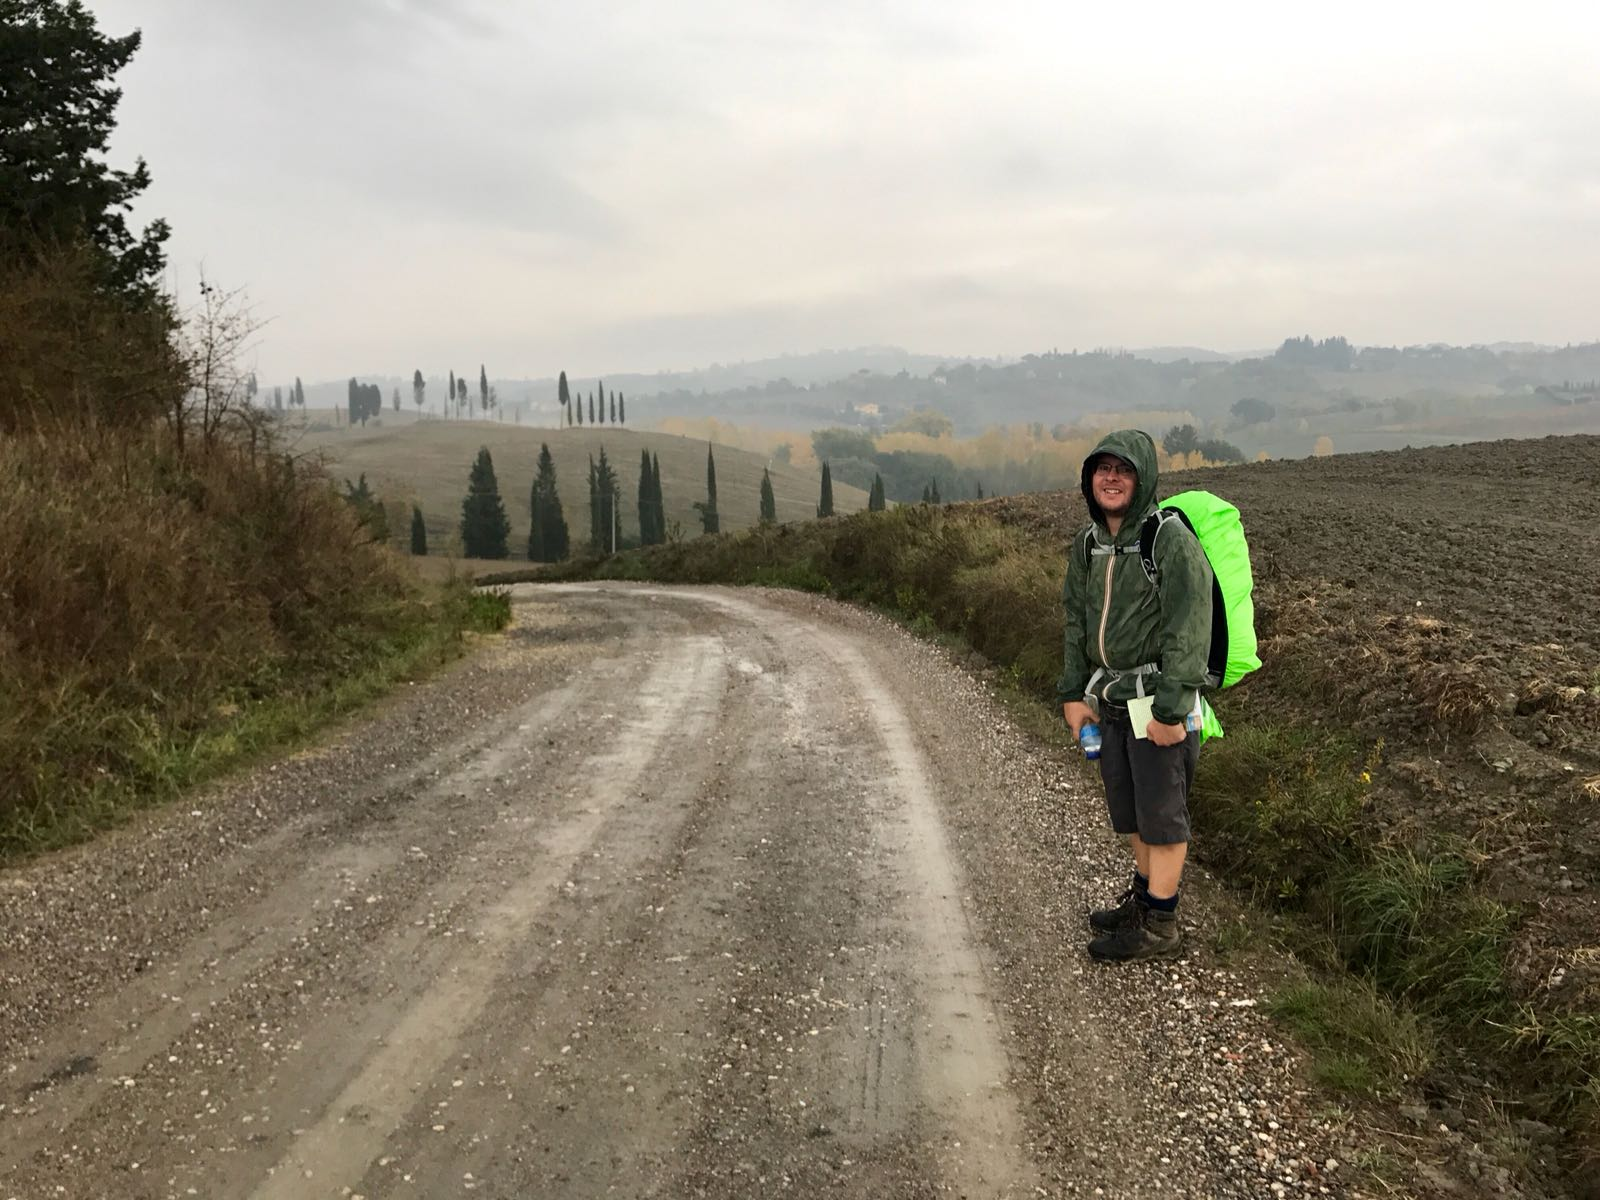 Tom on a rainy path to Castelfiorentino